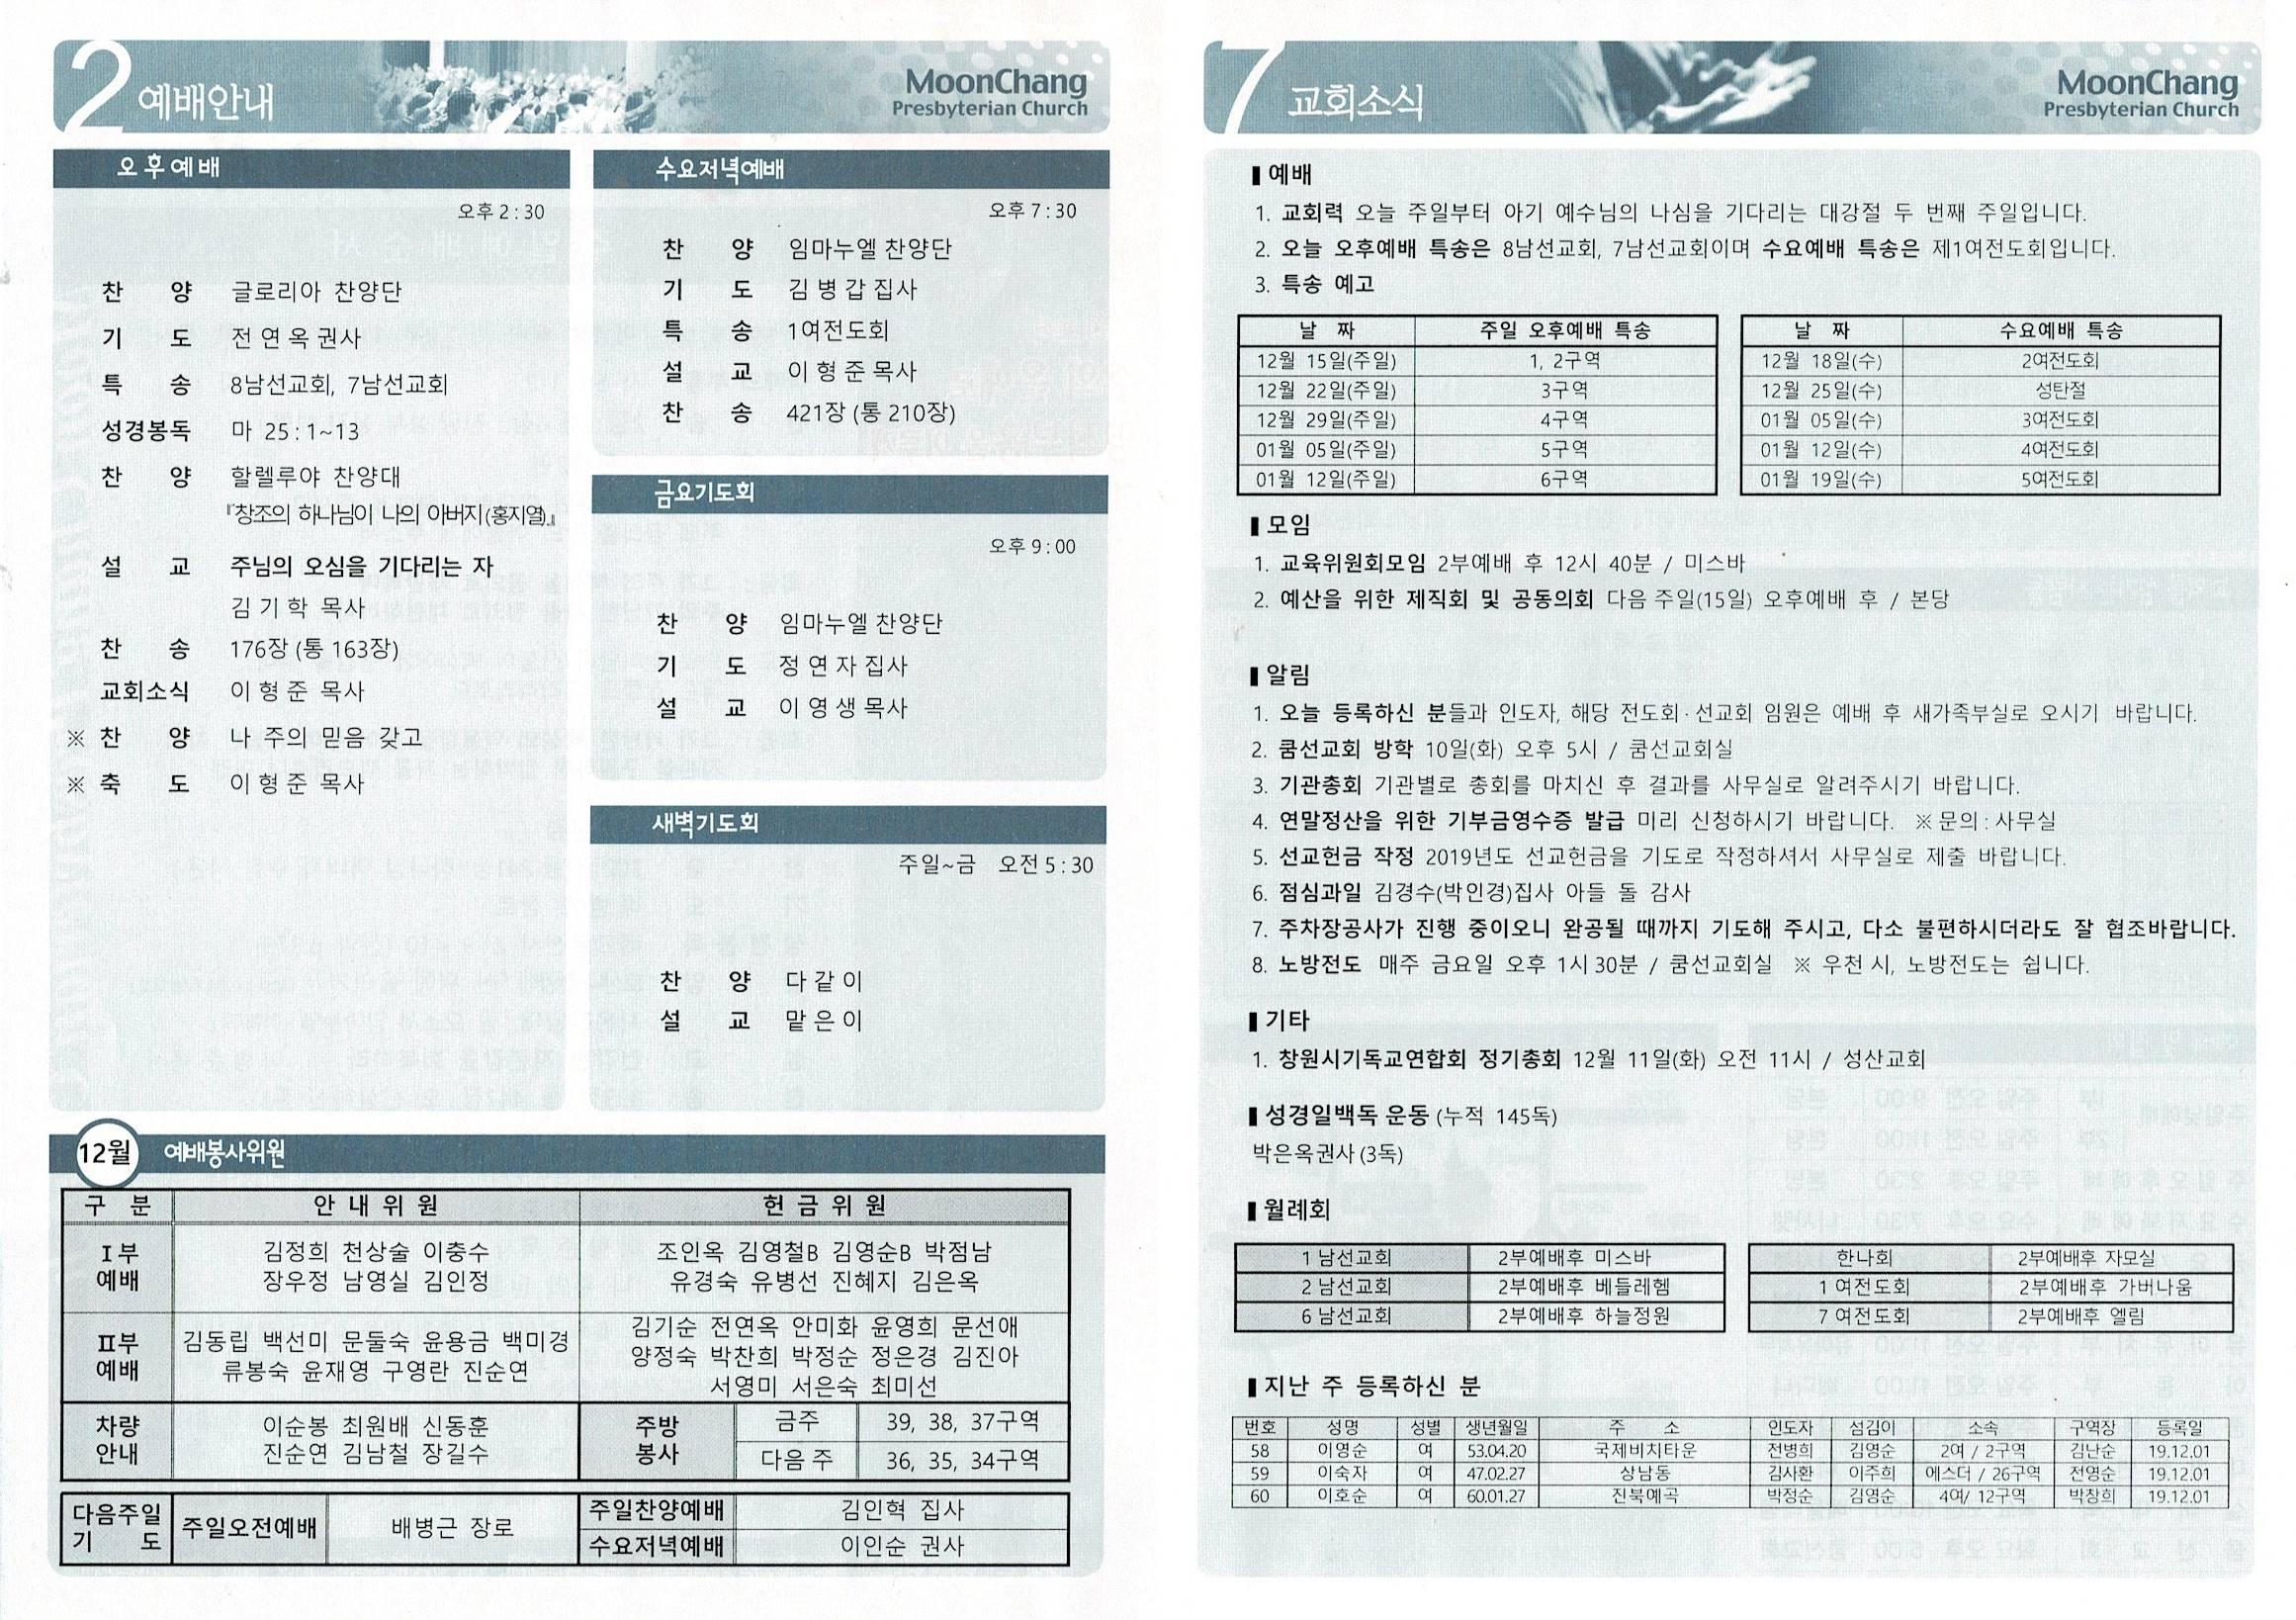 Scan2019-12-07_150106_001.jpg